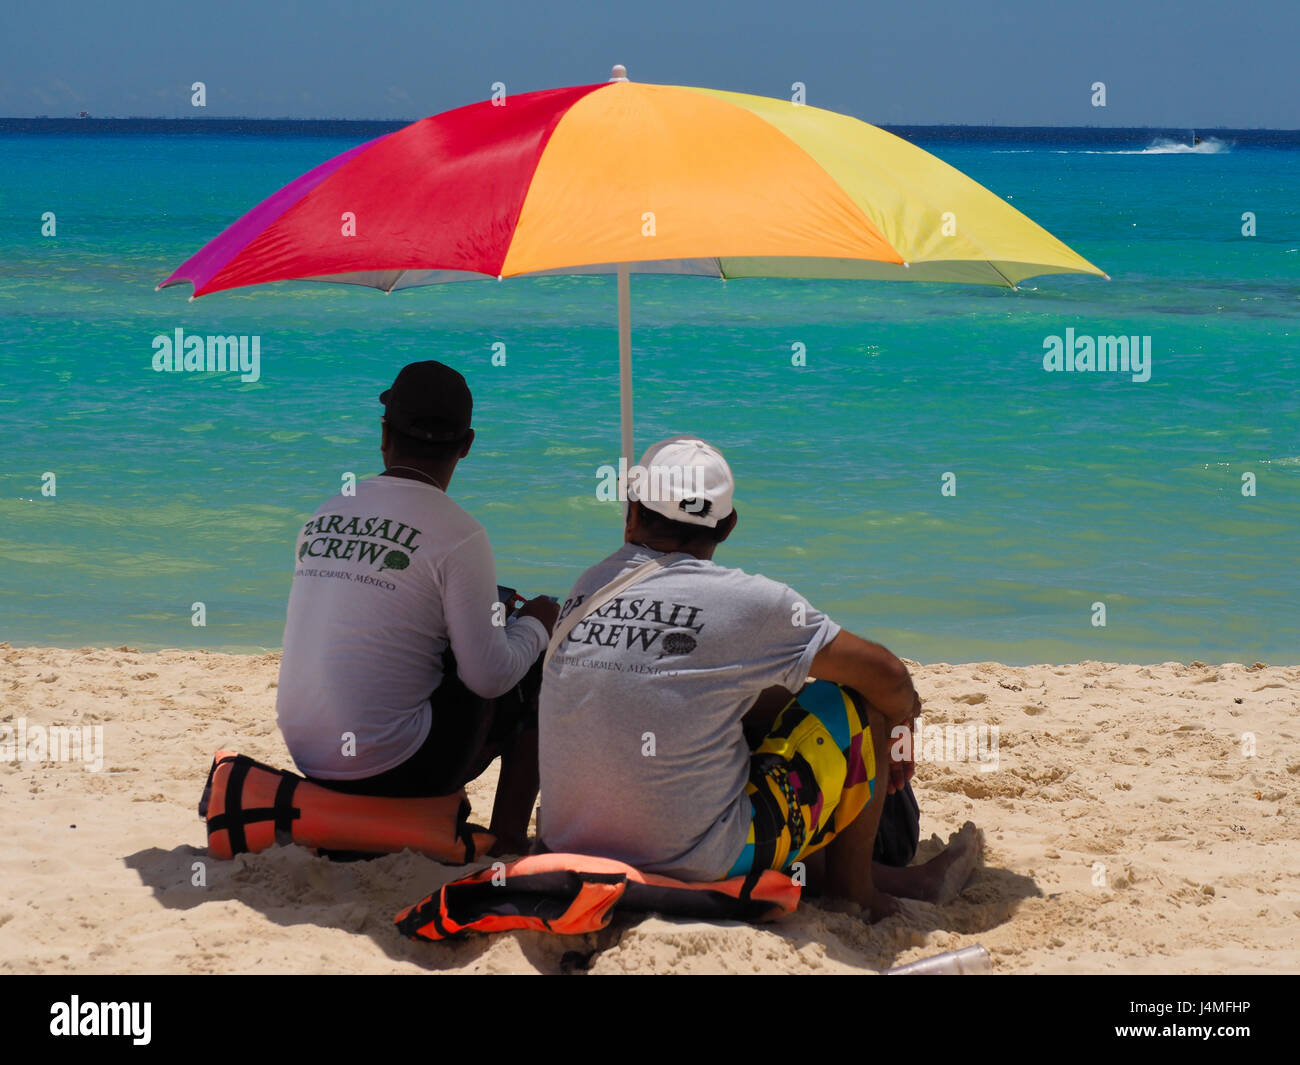 Beach vendors sheltering beneath beach brolly - Stock Image